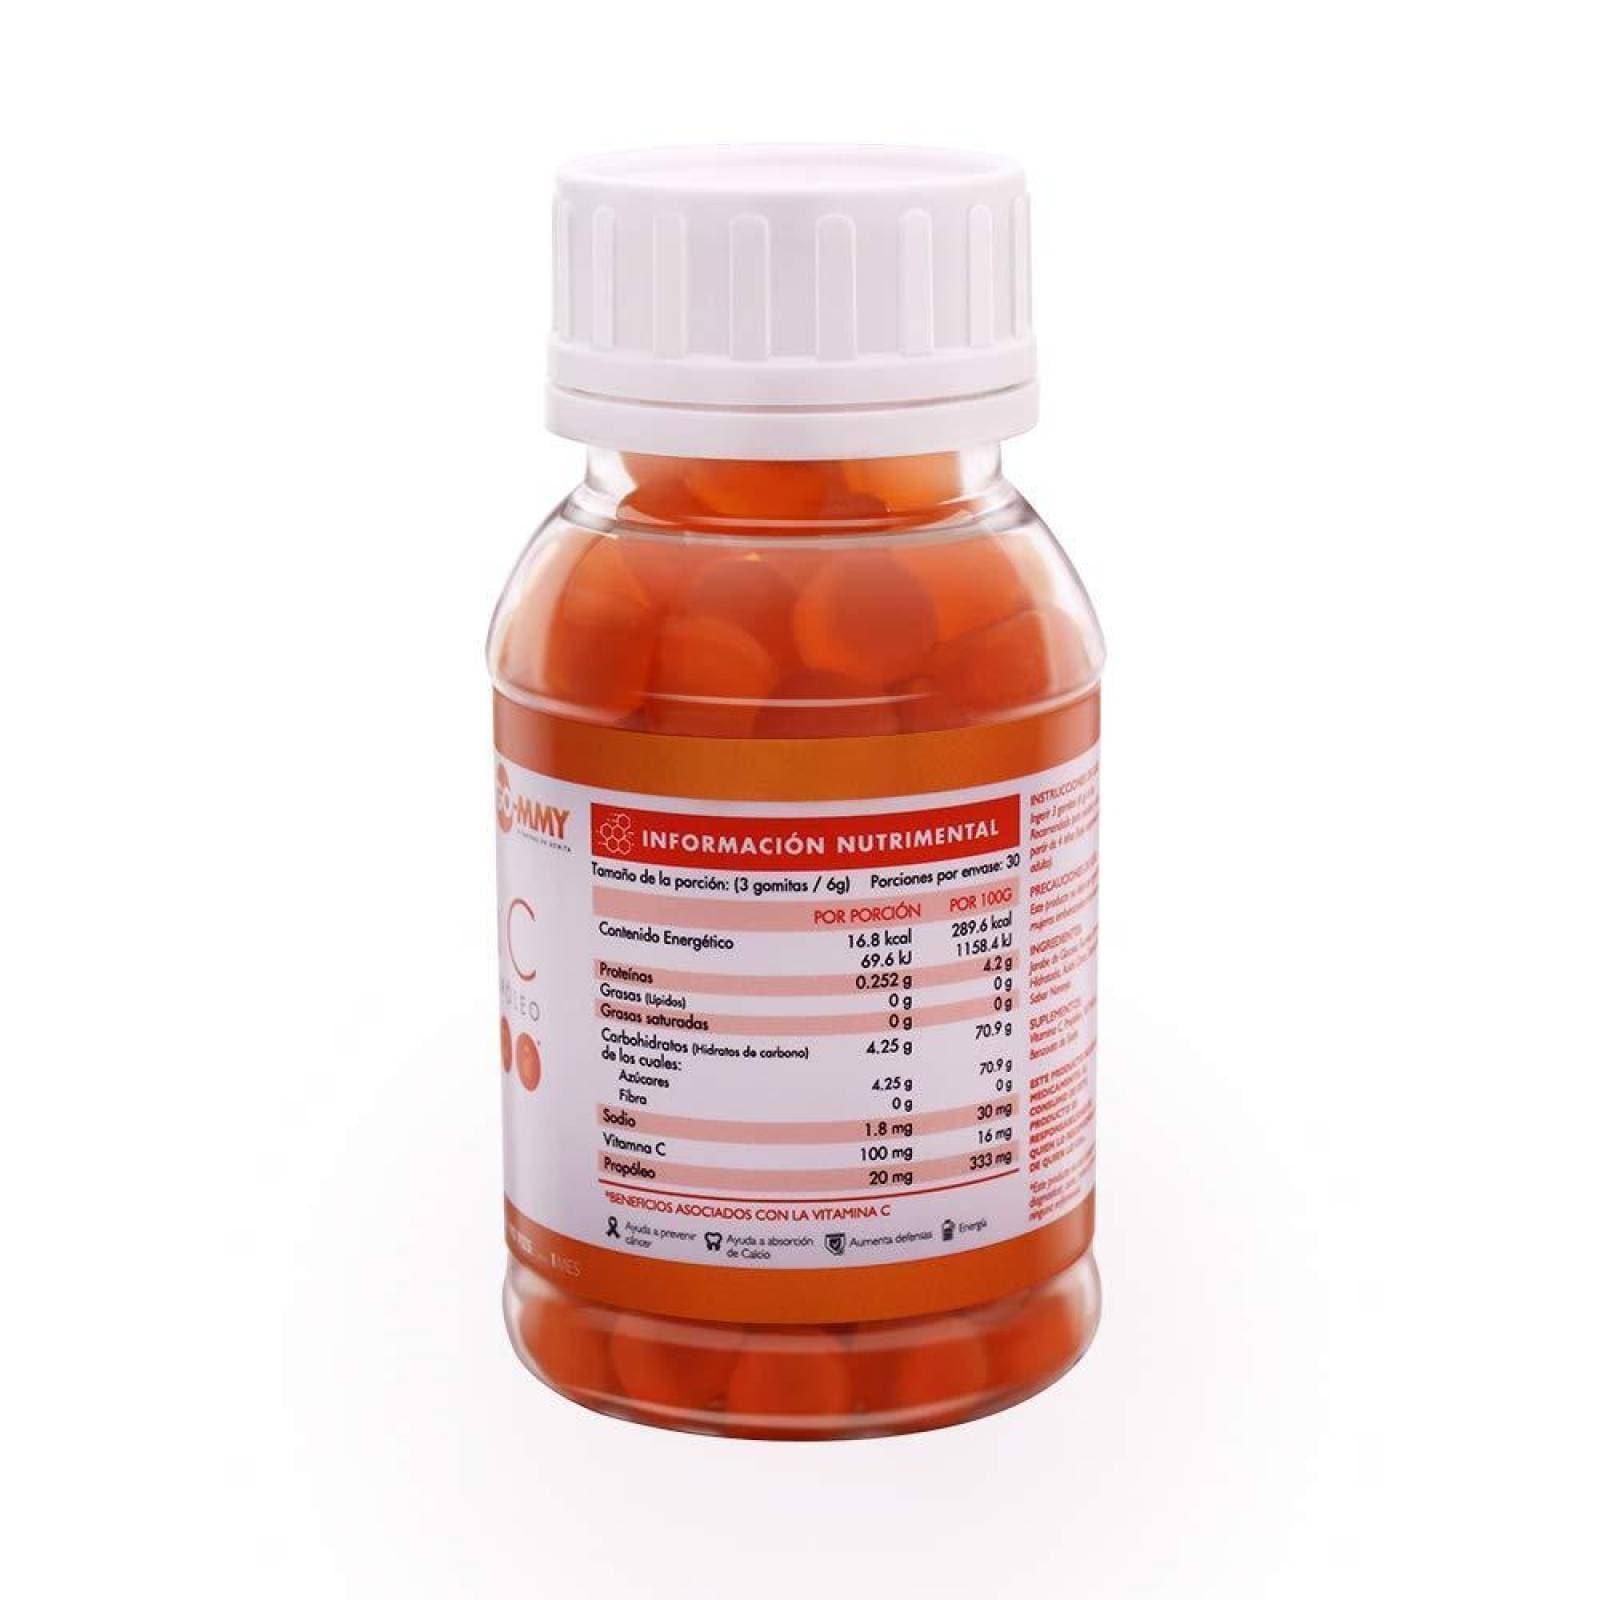 Vitamina C en gomitas GO-MMY GO Vita C 3 Frascos